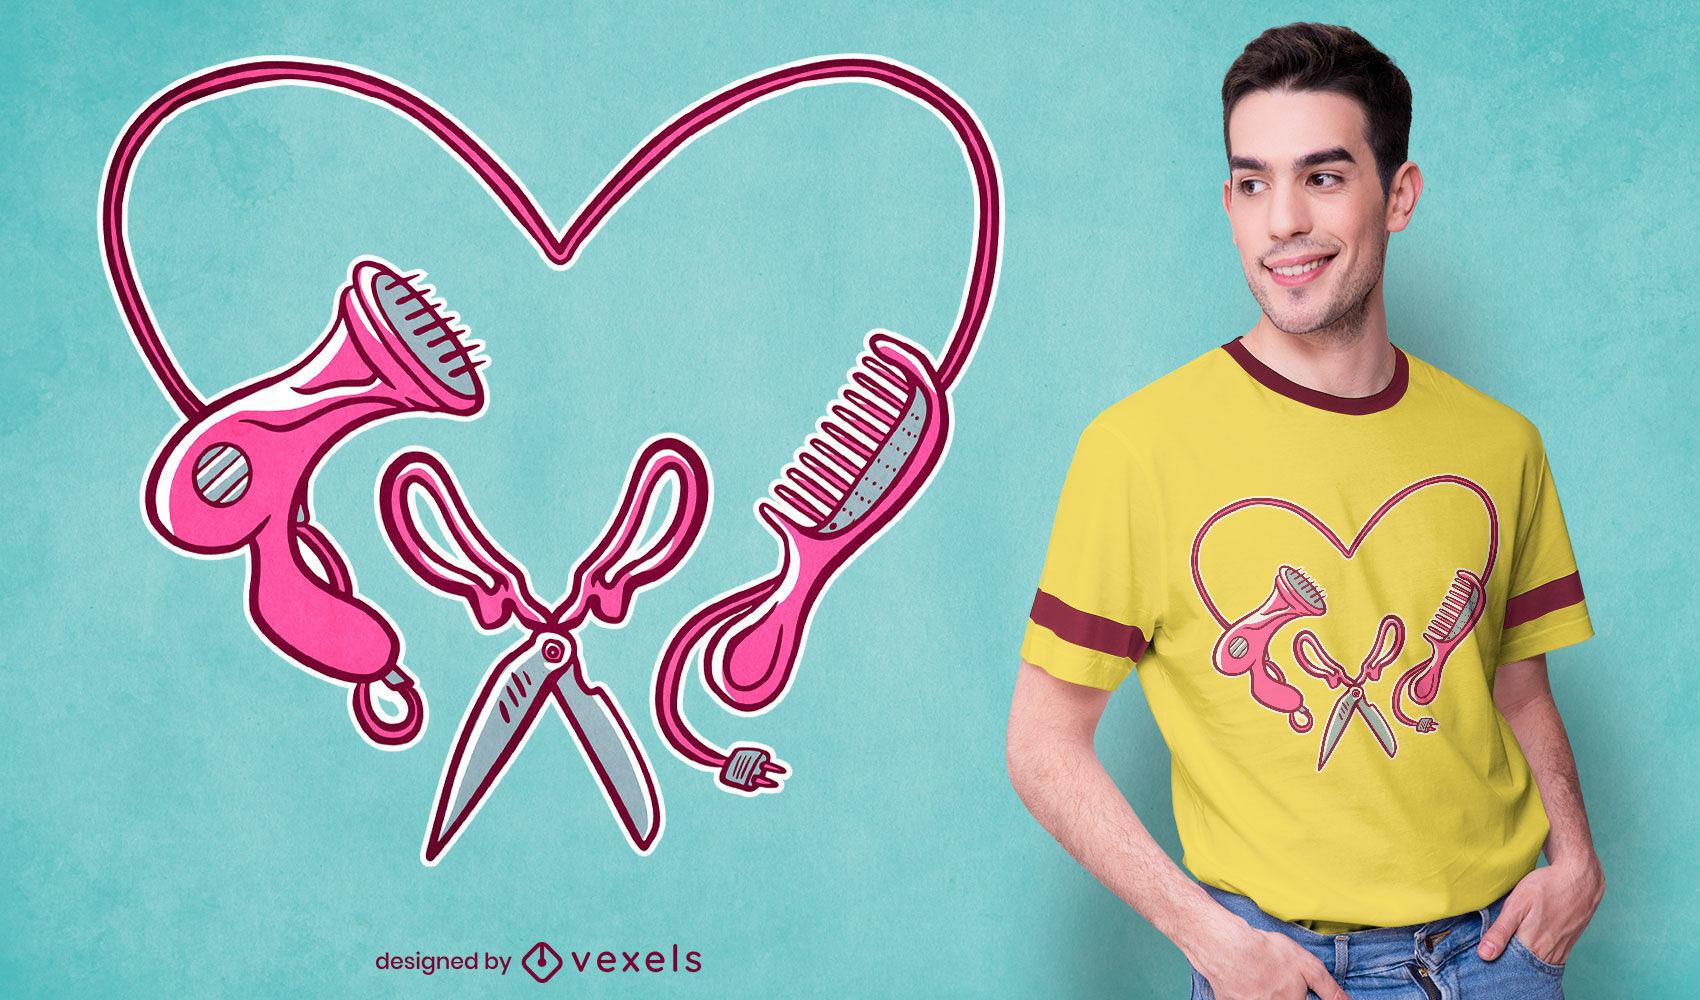 Hairdresser job tools t-shirt design